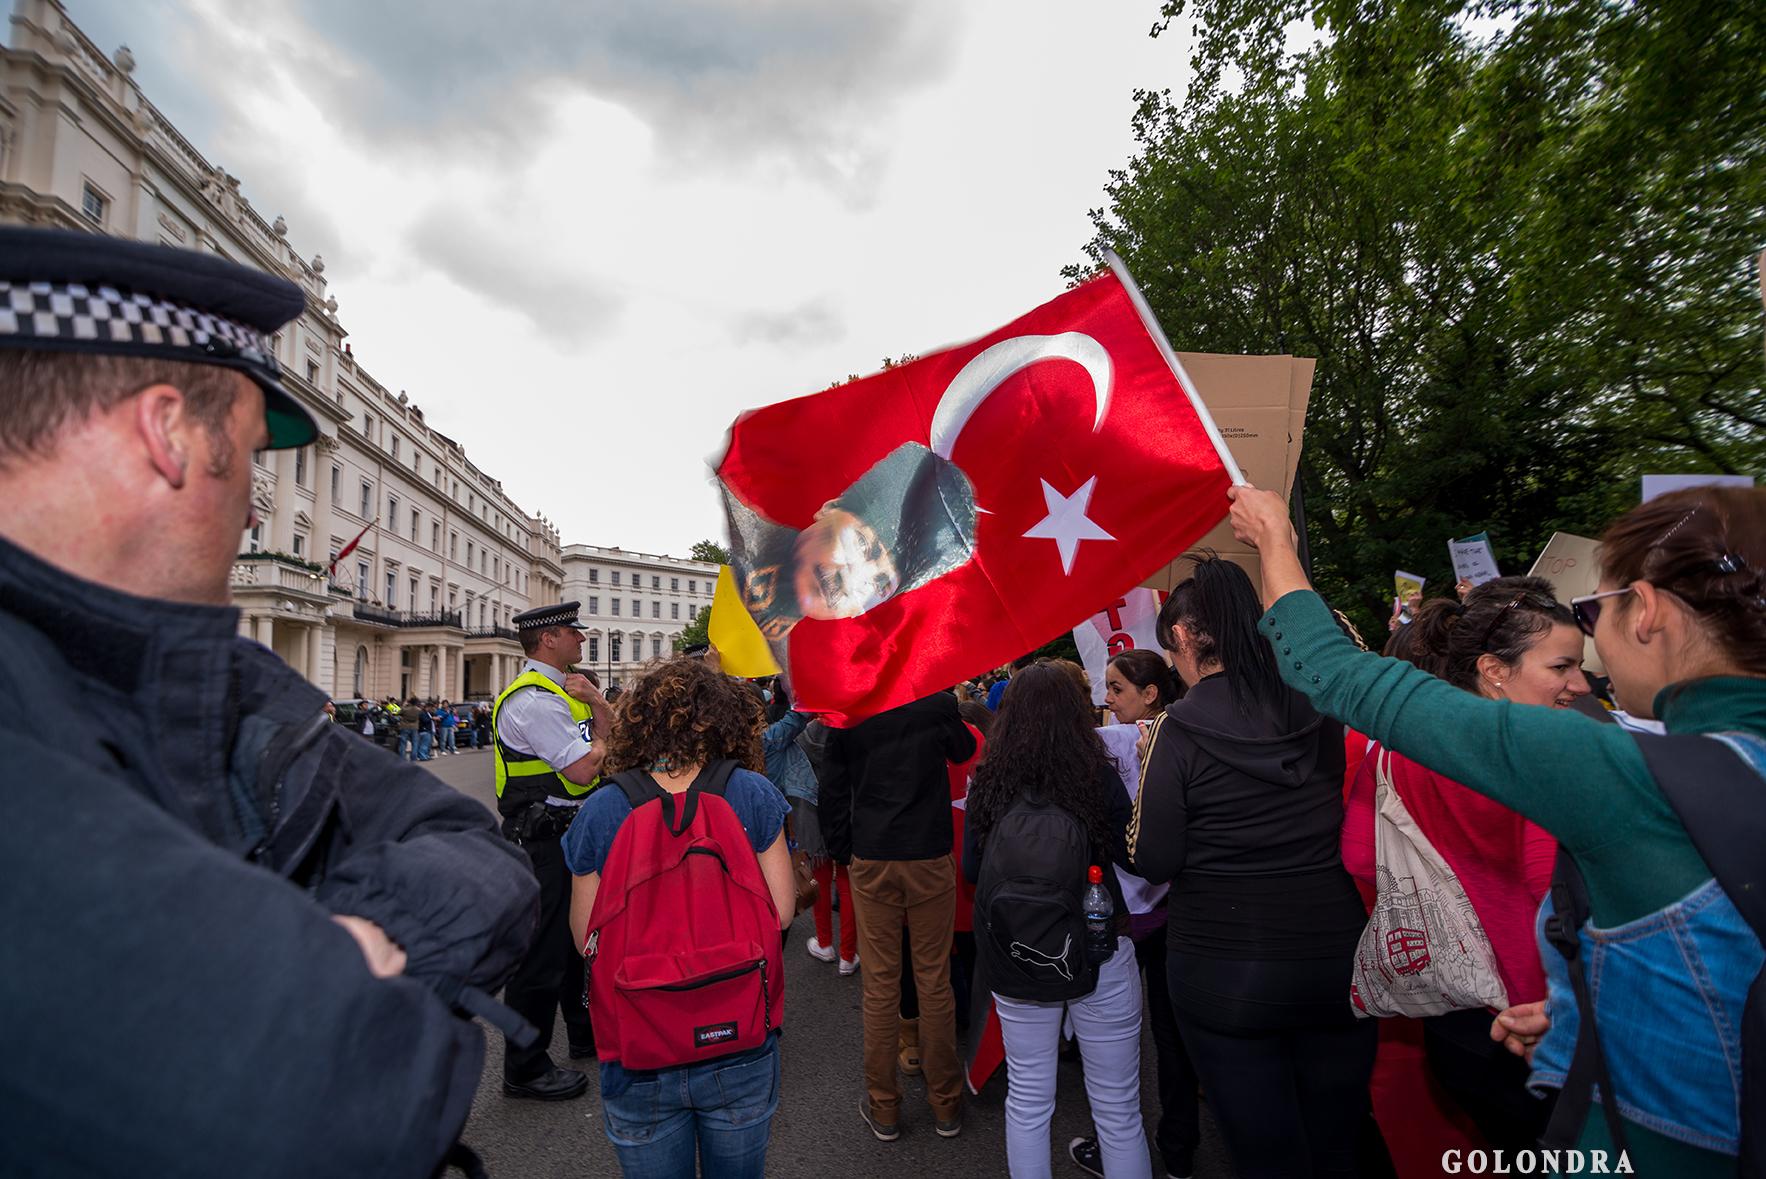 Protesting Turkish Government - Turk Hukumetini Protesto - Londra - London (41)